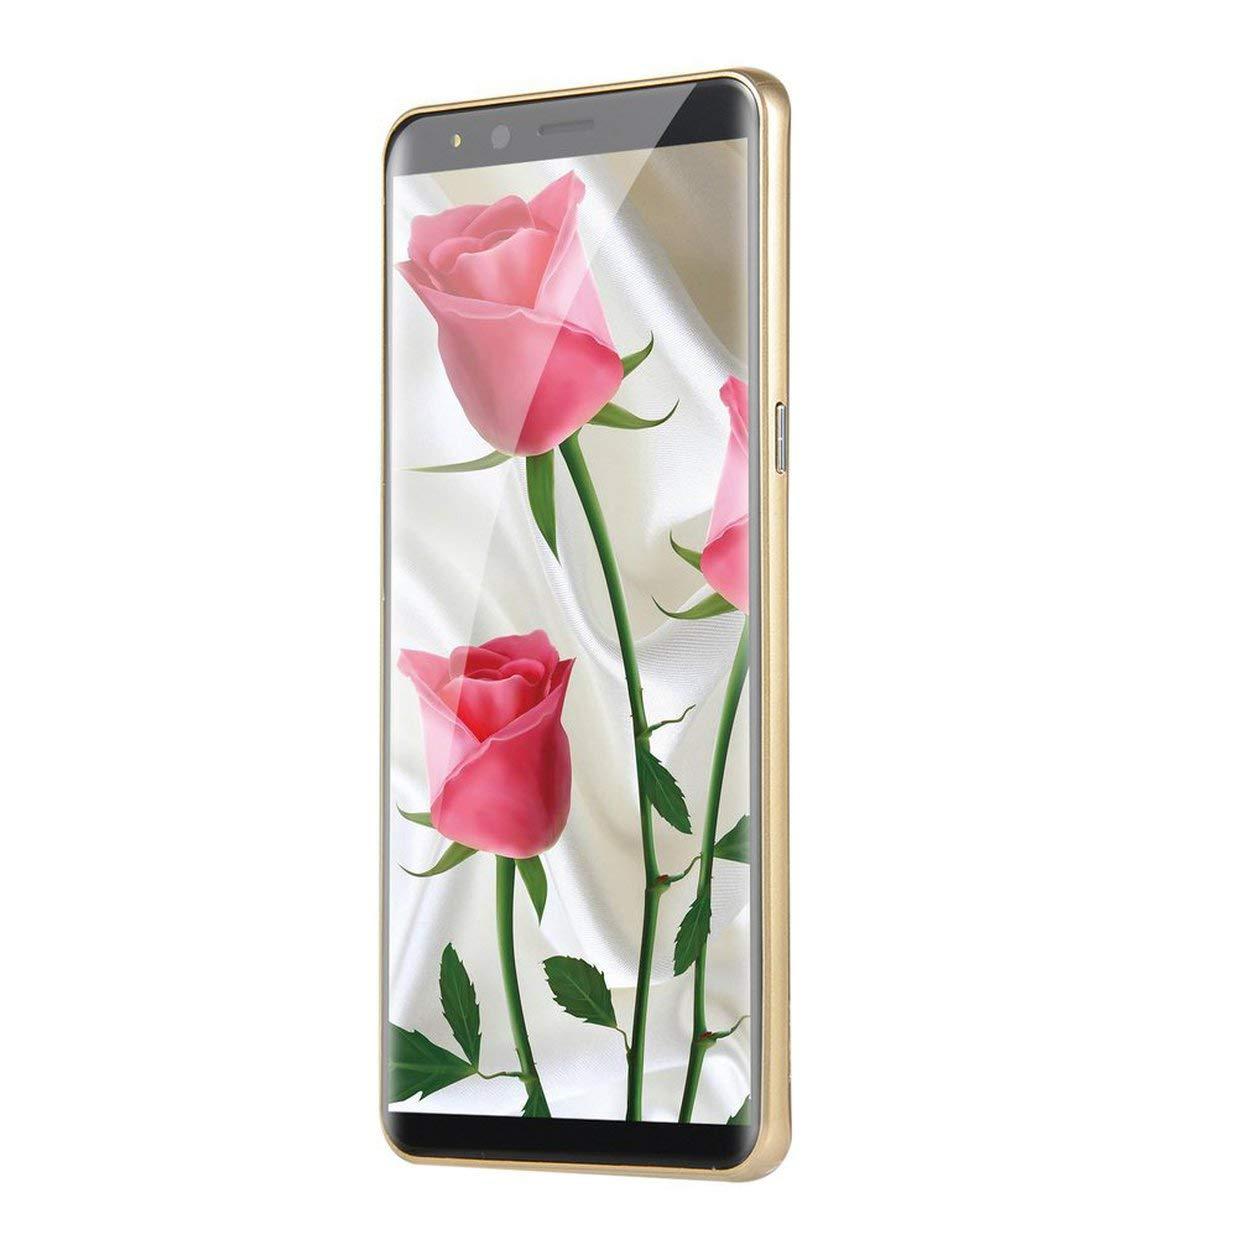 Lorenlli Moda 5.7 Pulgadas Dual HDCamera Smartphone Android 6.0 IPS Pantalla Completa gsm / WCDMA Pantalla táctil WiFi GPS 2G Llamada: Amazon.es: Electrónica